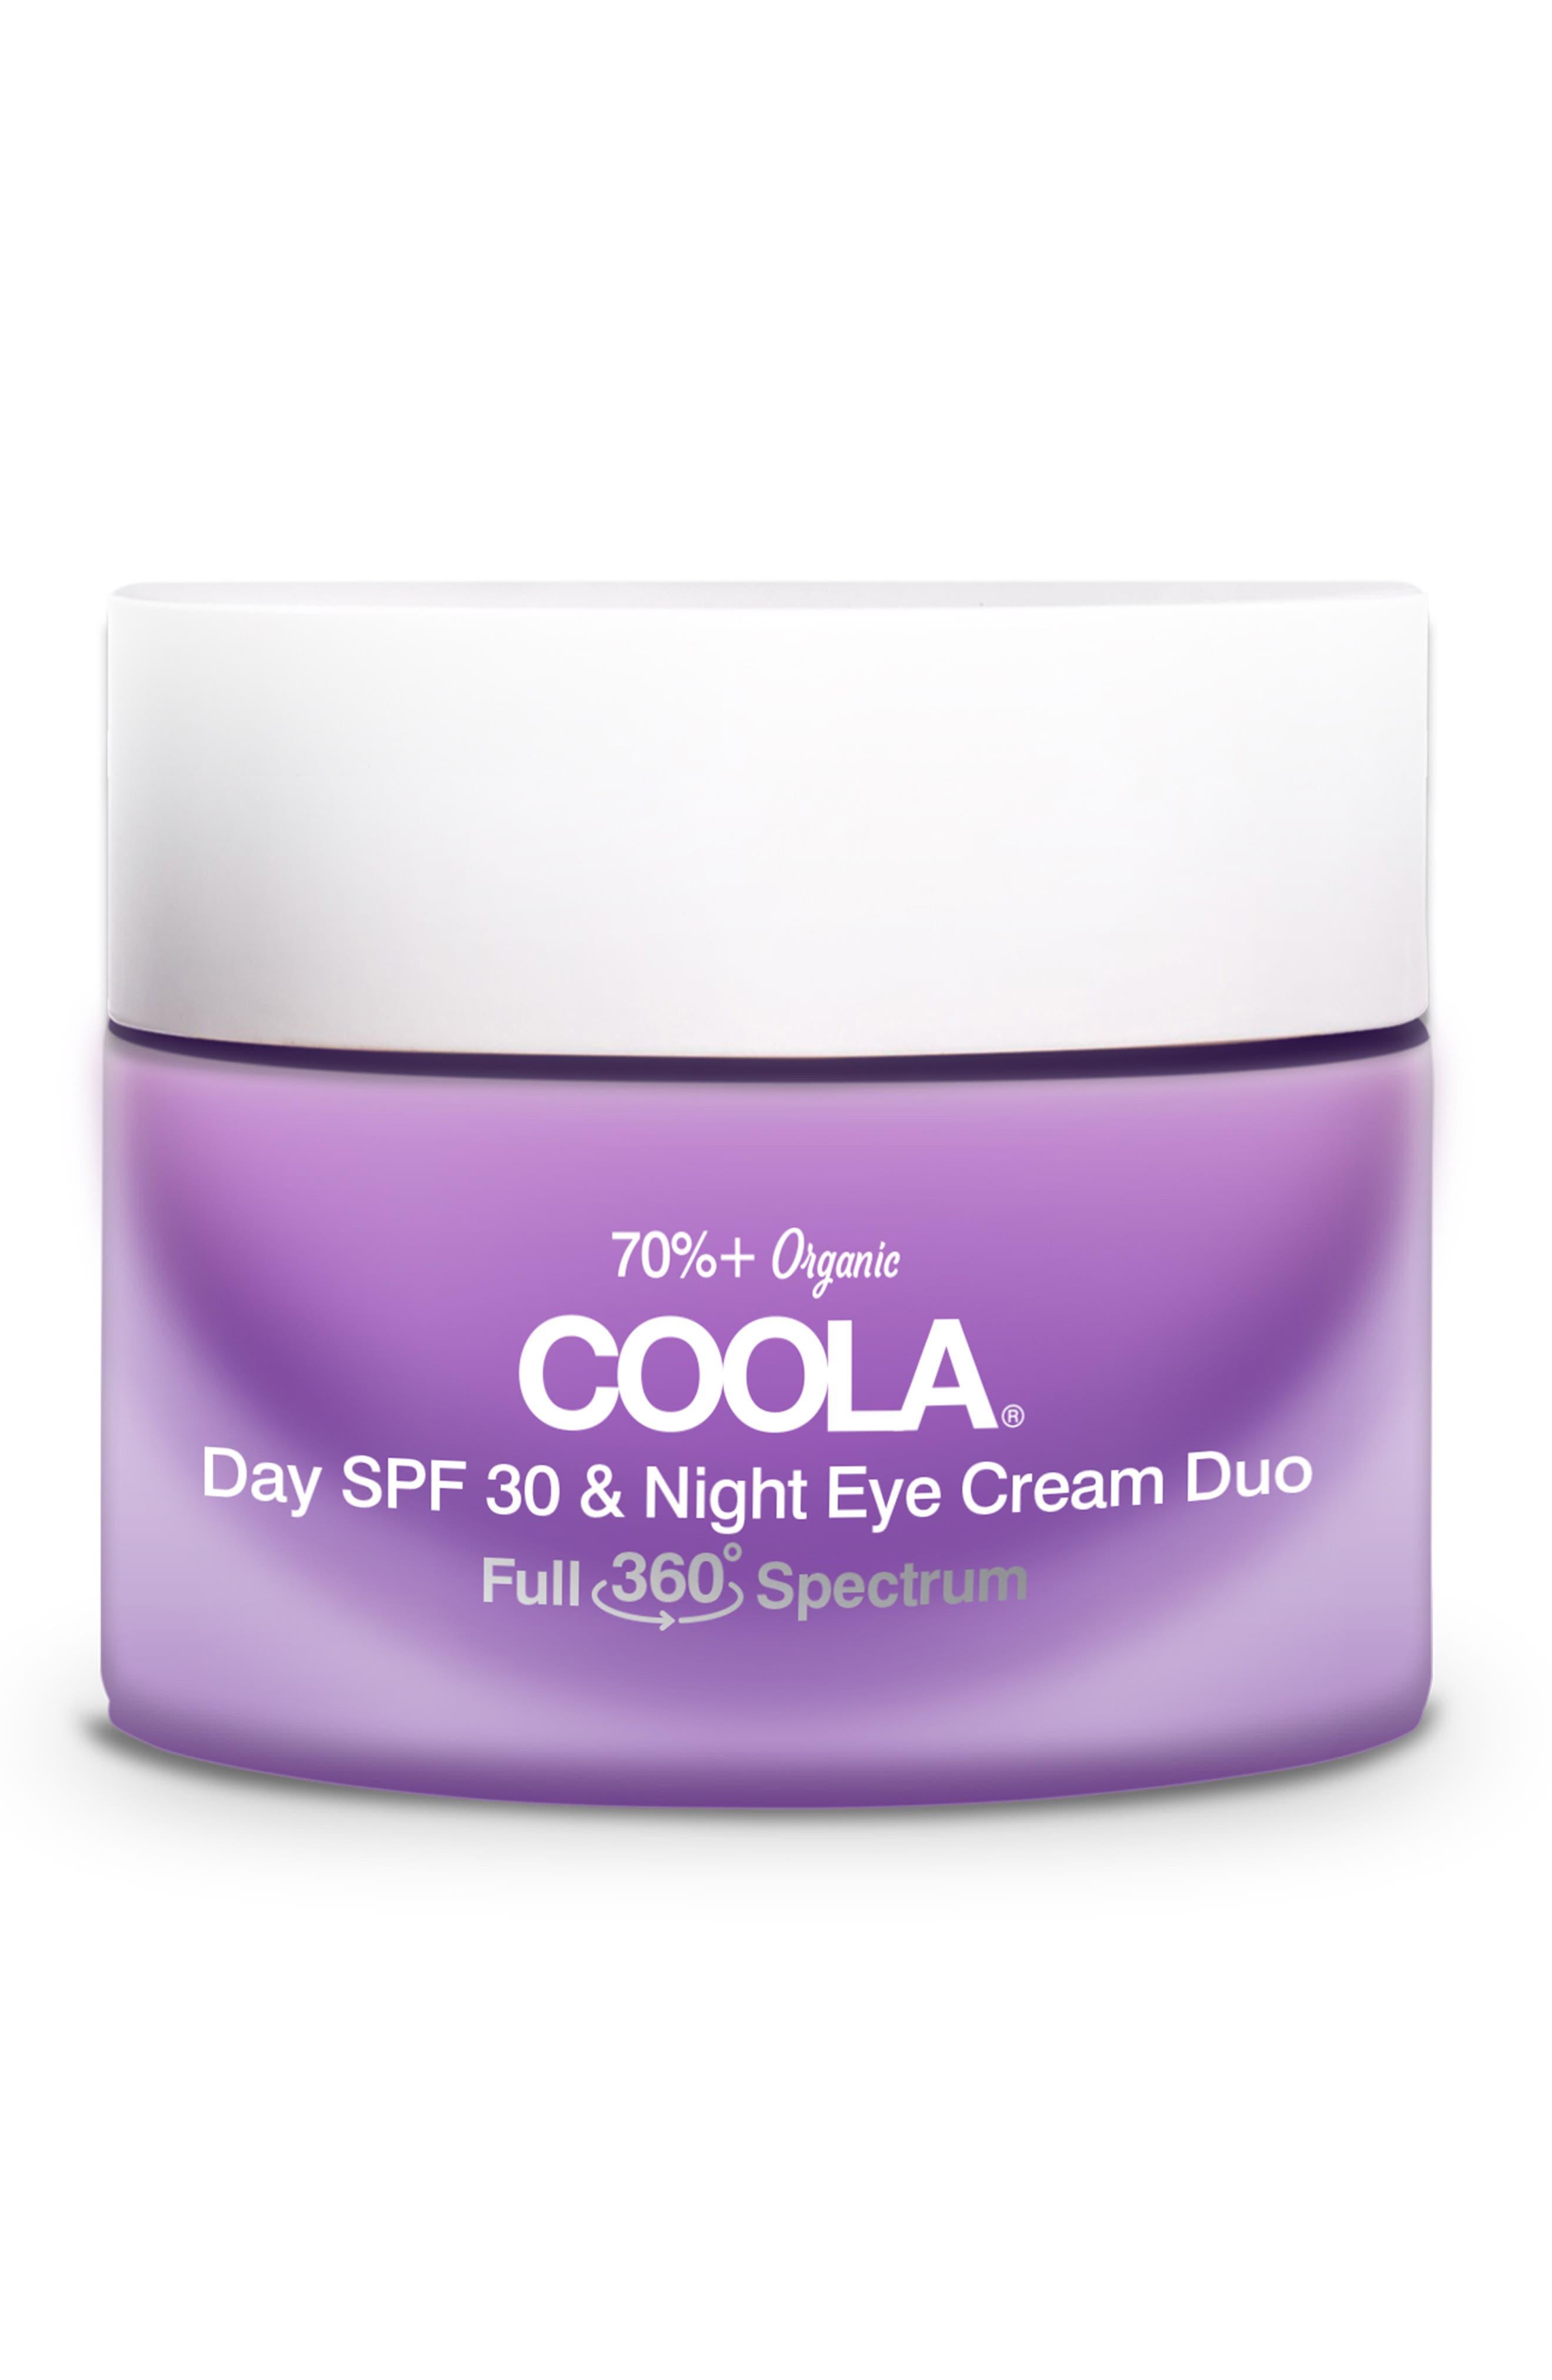 Coola Full Spectrum 360? Day Spf 30 & Night Organic Eye Cream Duo